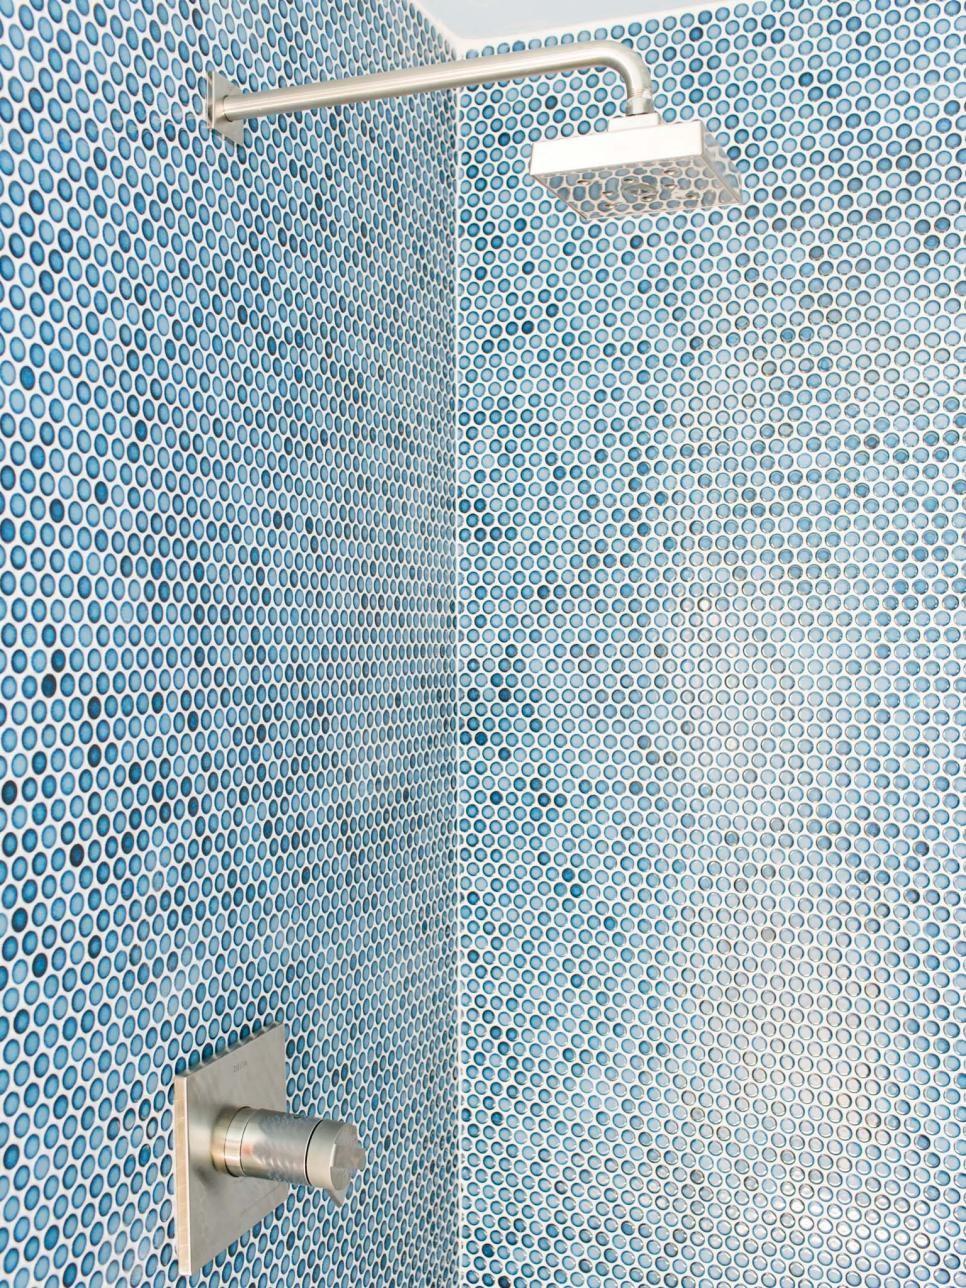 Dream Home 2016: Terrace Bathroom | hgtv dream home 2016 | Pinterest ...